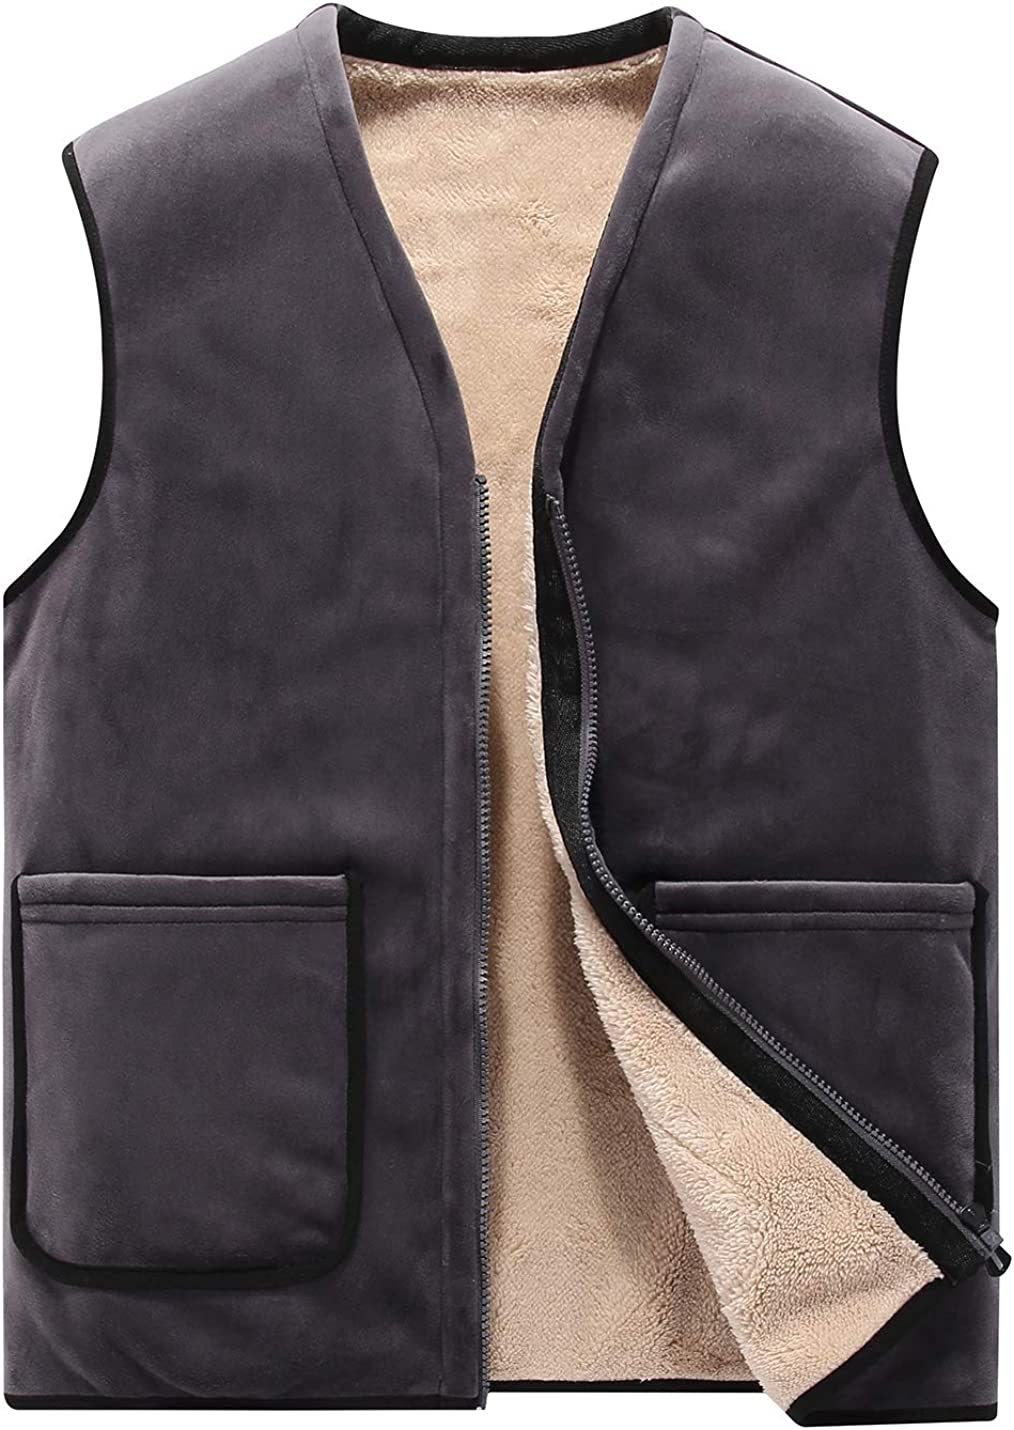 Flygo Men's Zip V-Neck Fleece Vest Winter Outdoor Warm Sherpa Lined Waistcoat Sleeveless Jacket